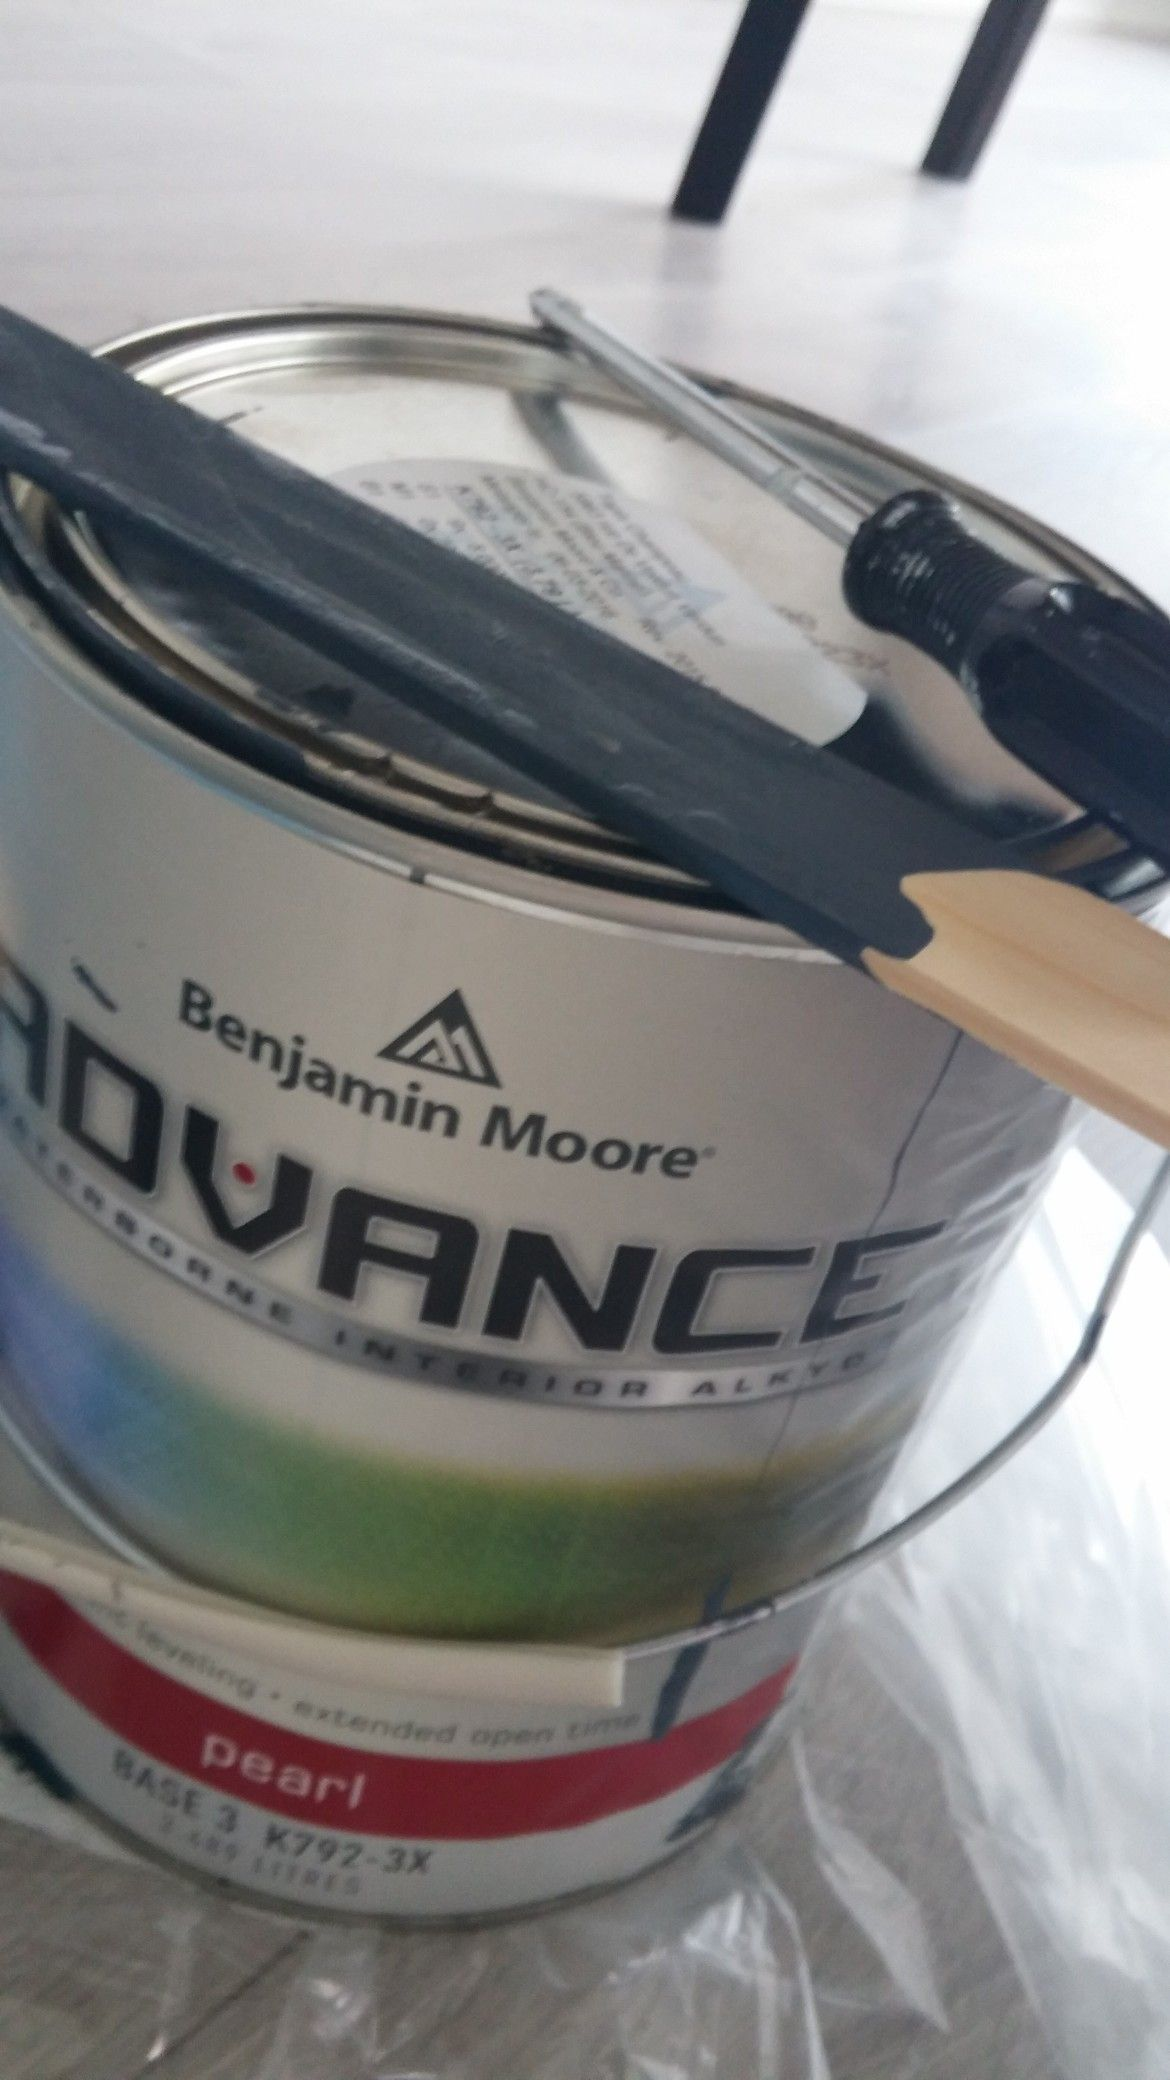 Benjamin Moore Advance Melamine Paint in Hale Navy (requires a primer for Melamine) #halenavybenjaminmoore Benjamin Moore Advance Melamine Paint in Hale Navy (requires a primer for Melamine) #halenavybenjaminmoore